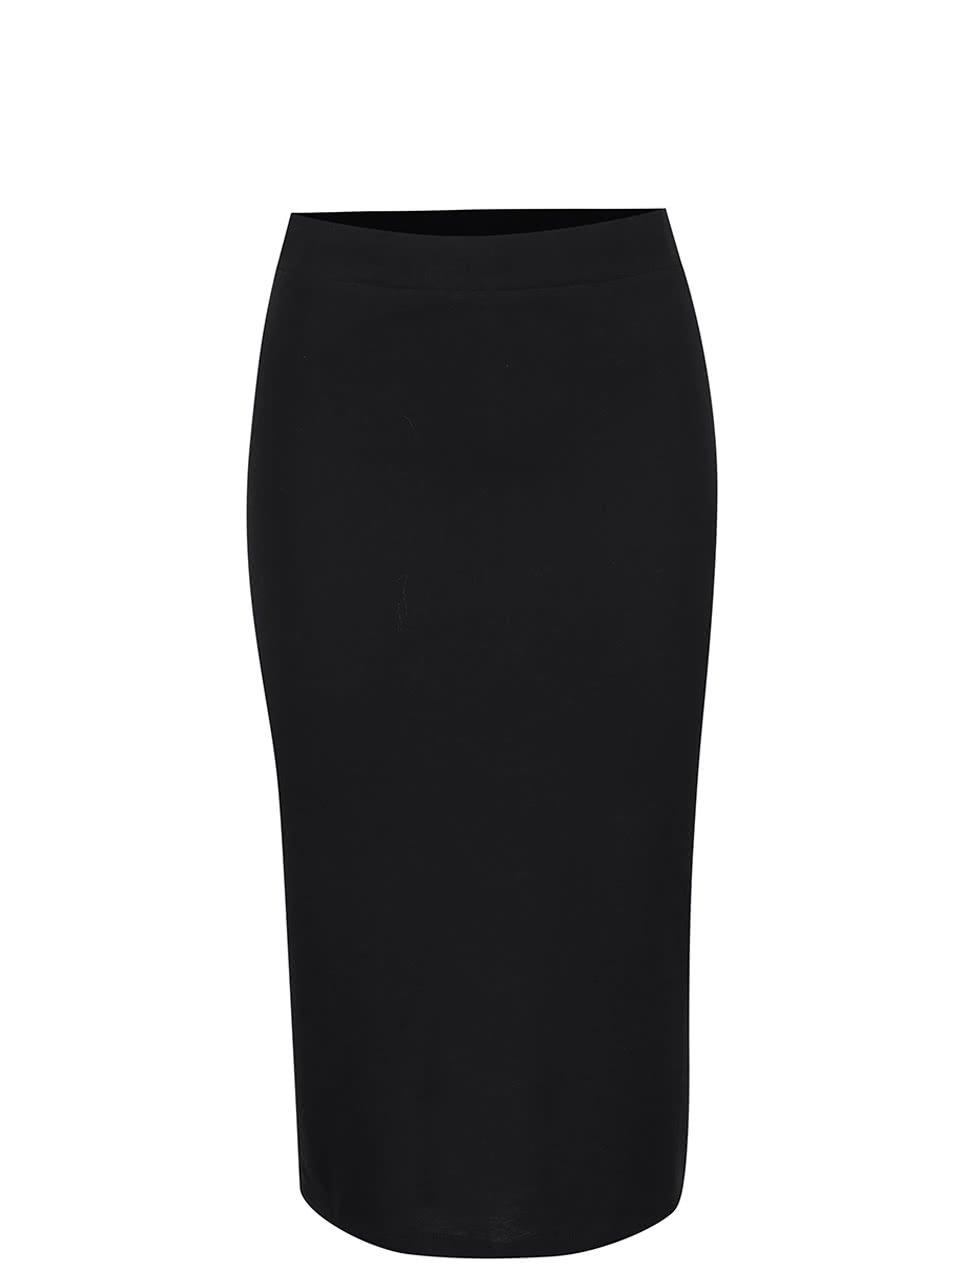 Černá sukně Vero Moda Nanna